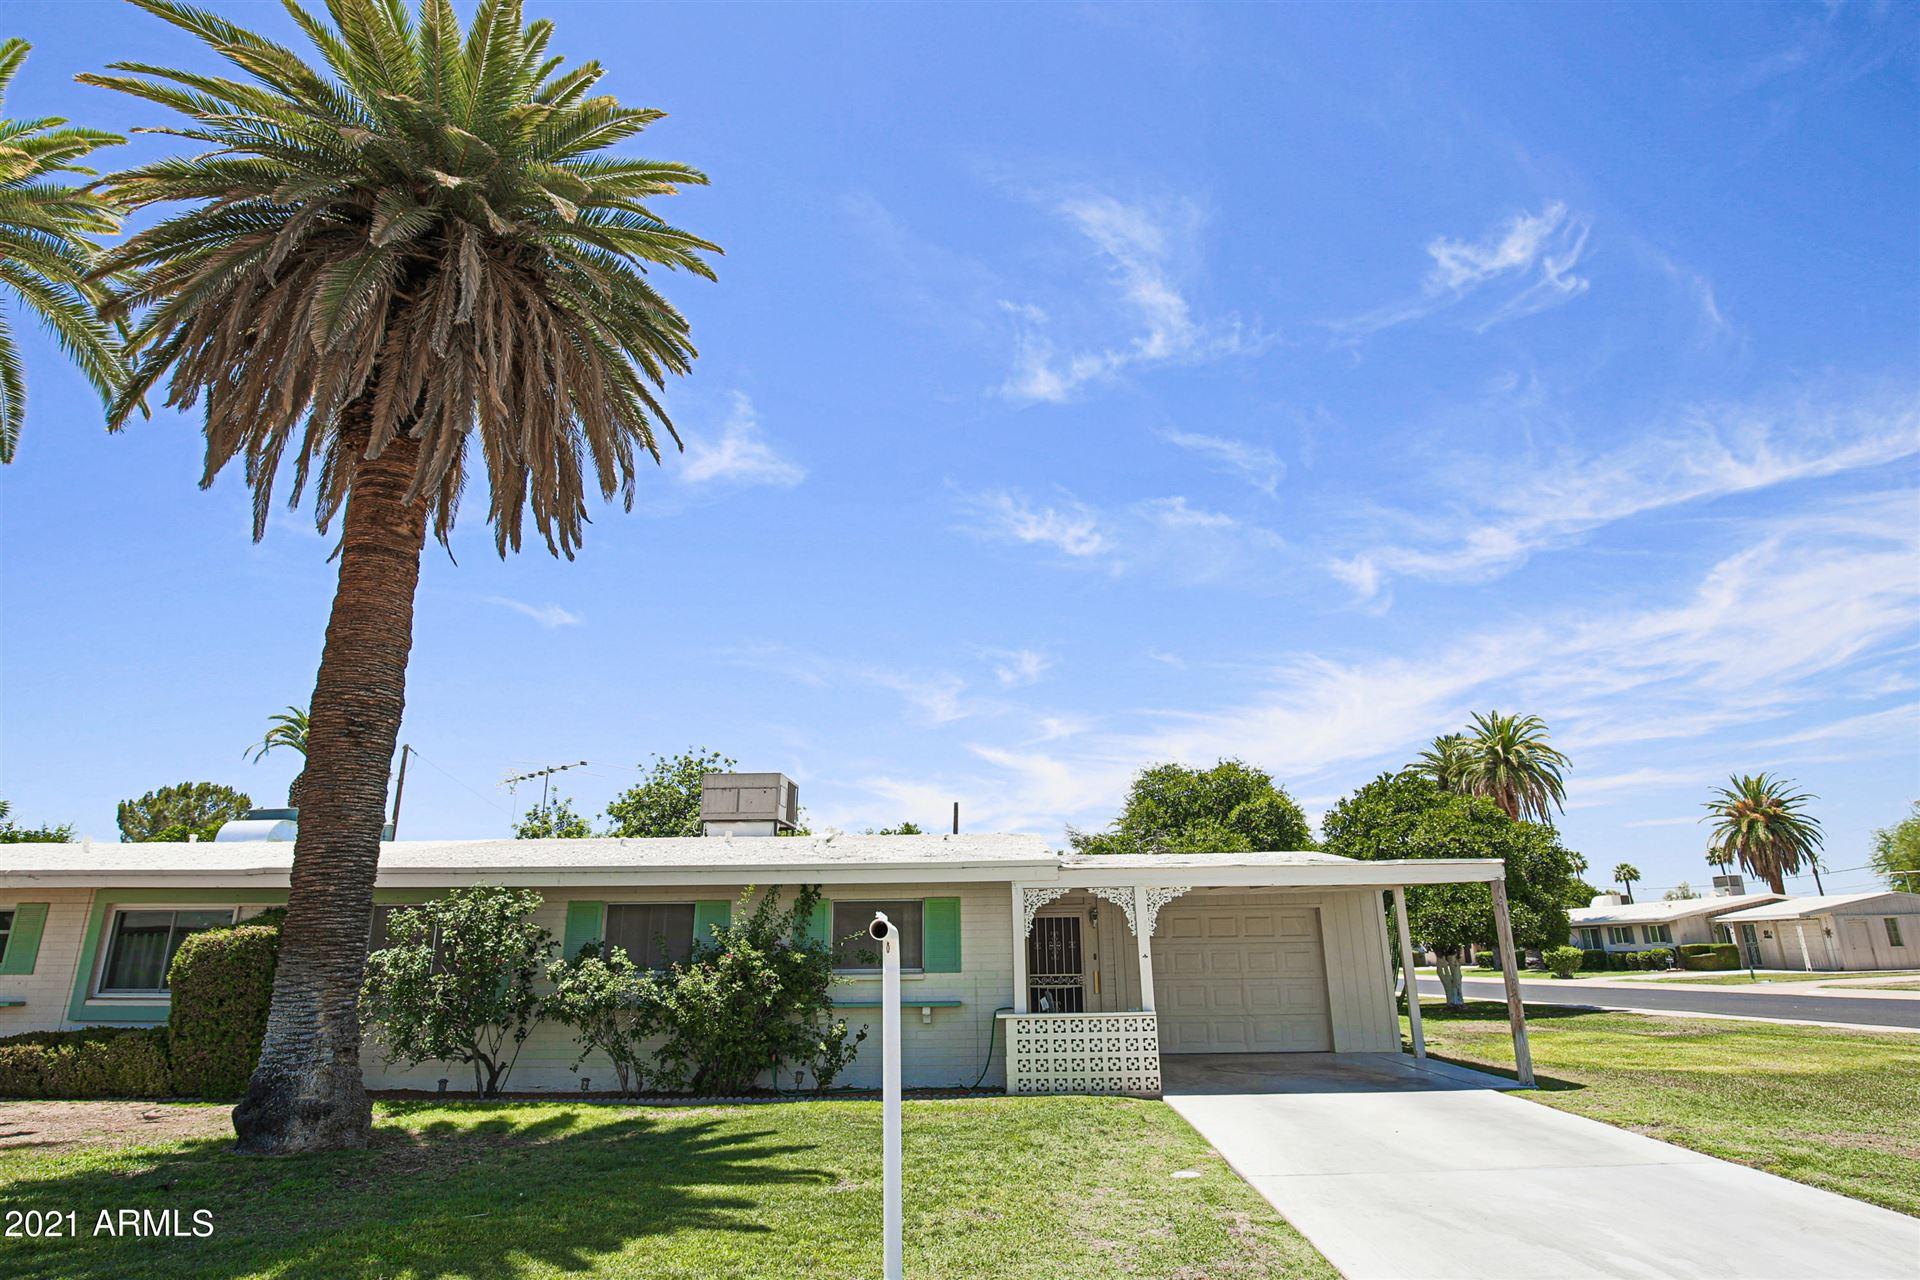 Photo of 10213 W SNEAD Circle N, Sun City, AZ 85351 (MLS # 6249515)